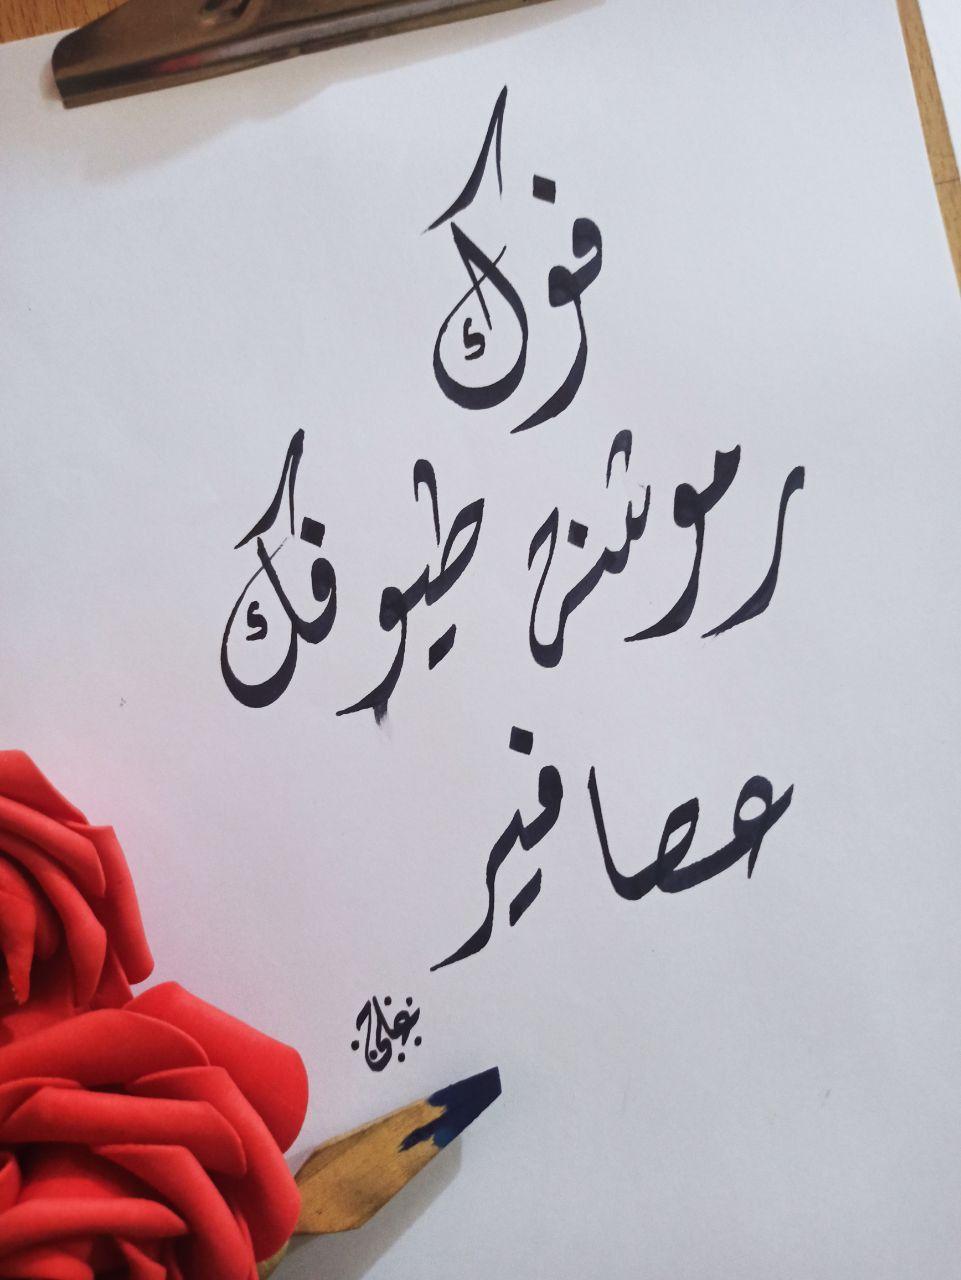 فوك رموشنه طيوفك عصافير Art Instagram Instagram Photo